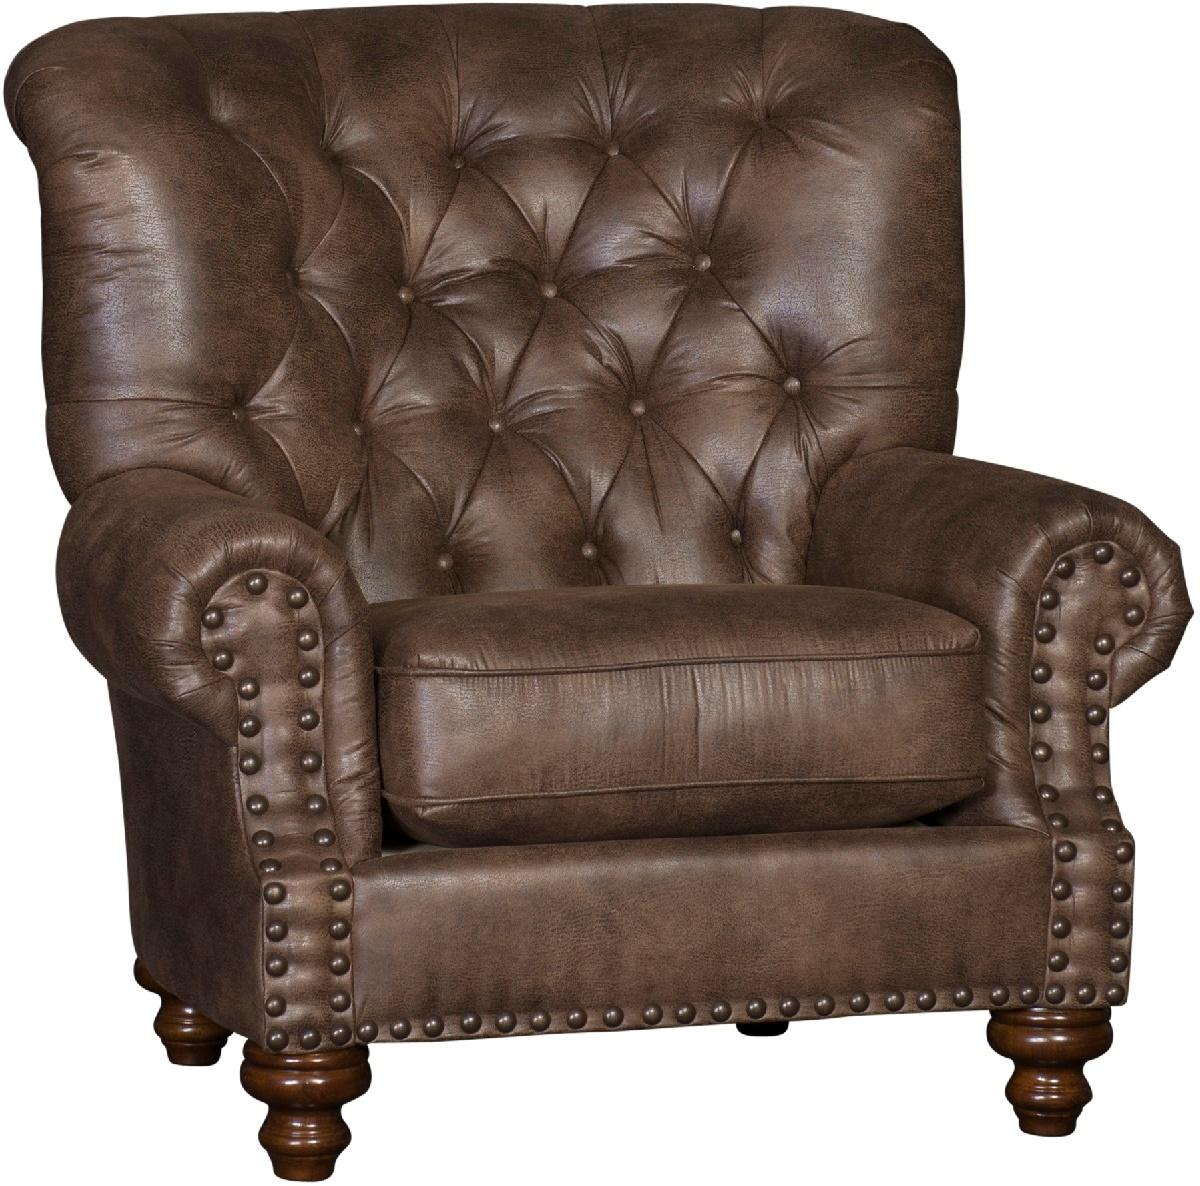 Chelsea Home Hall Chair Antique Nails Walnut Finish Vagabond Elk